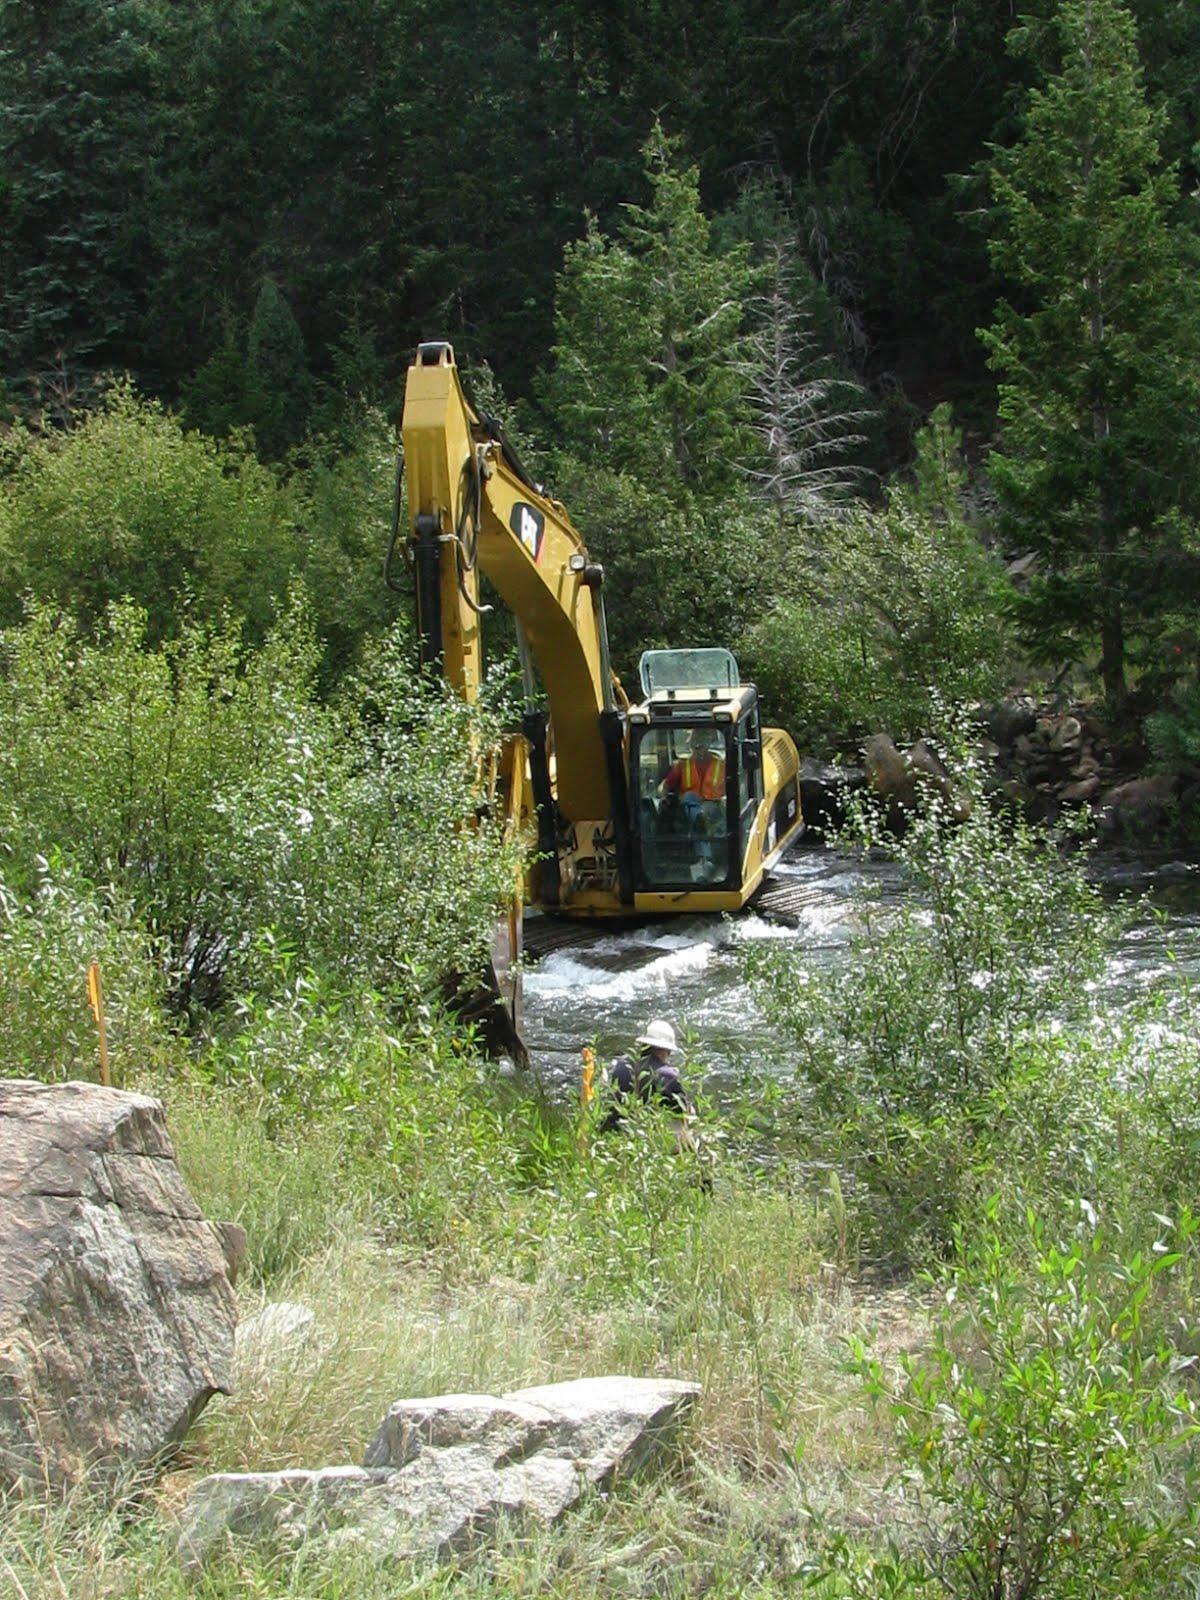 Gold Strike Colorado Prospecting: Can I Do Some Small ...